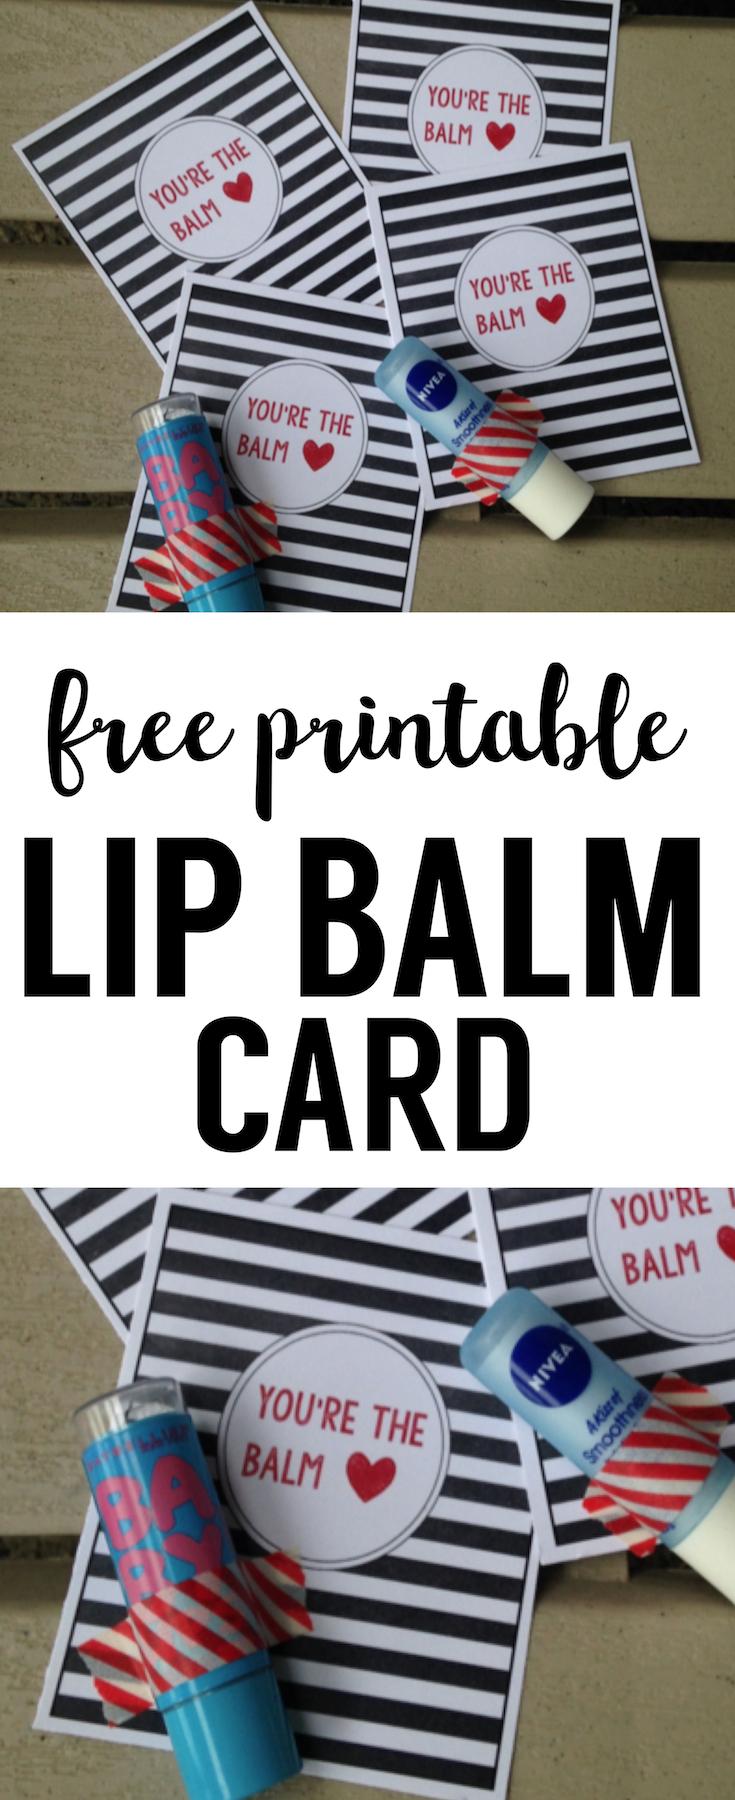 photograph regarding You Re the Balm Printable referred to as Chapstick Card Totally free Printable \